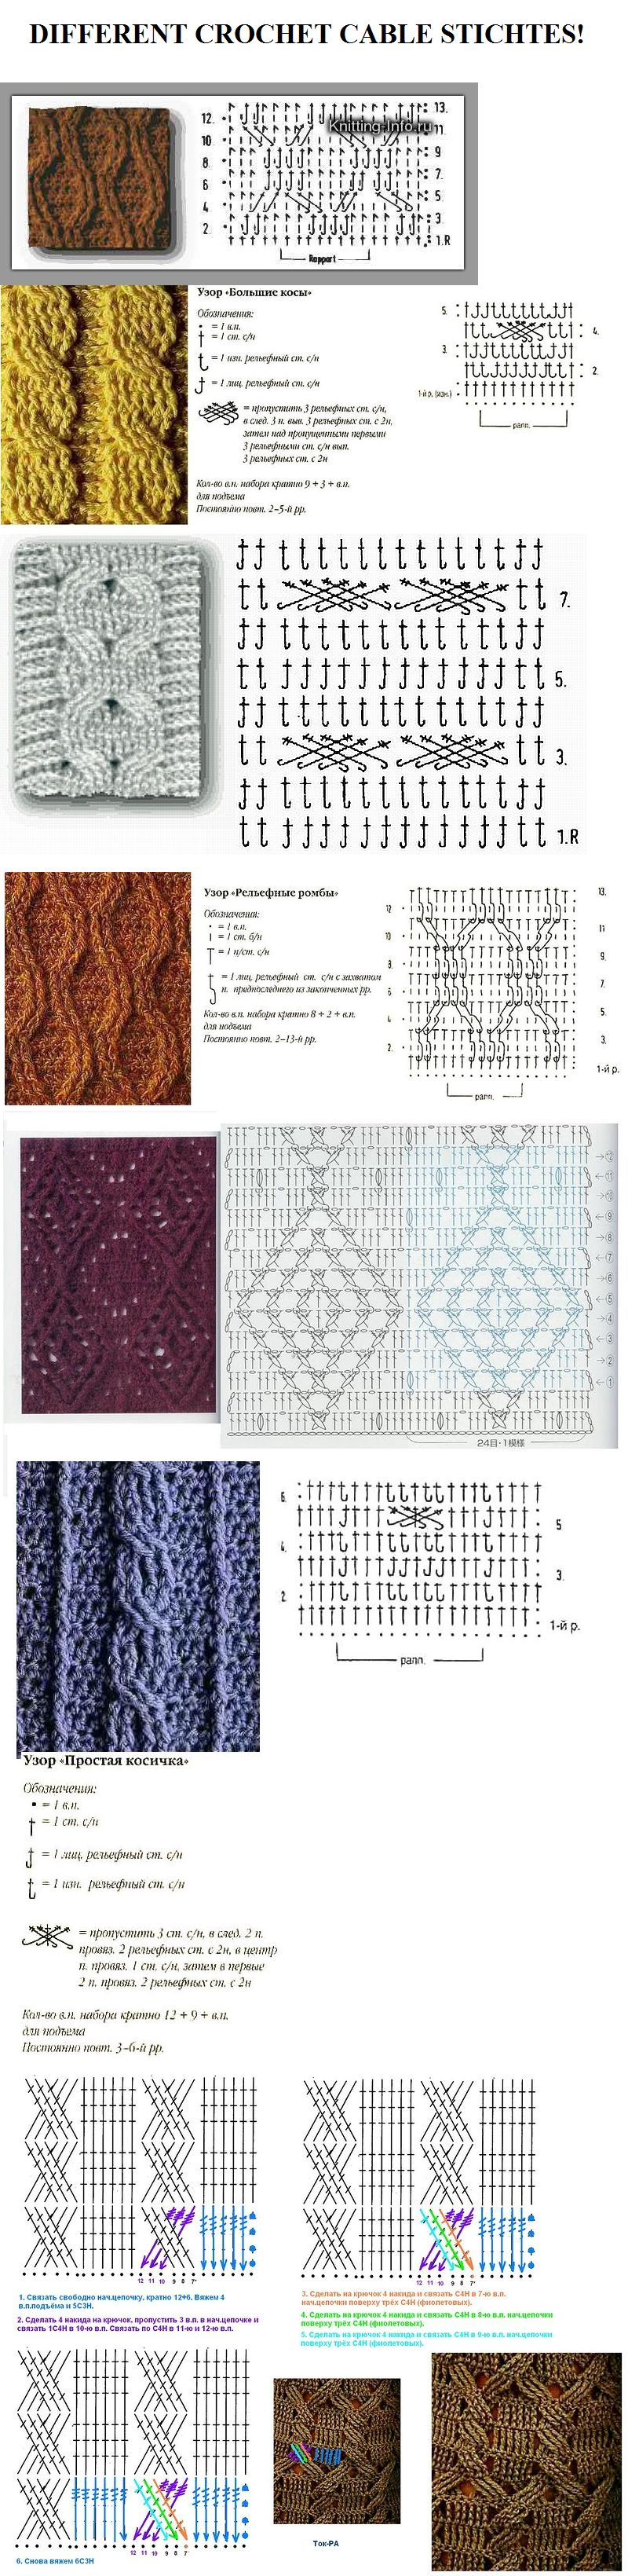 Crochet afghans | Manualidades | Pinterest | Esquemas, Ganchillo y ...